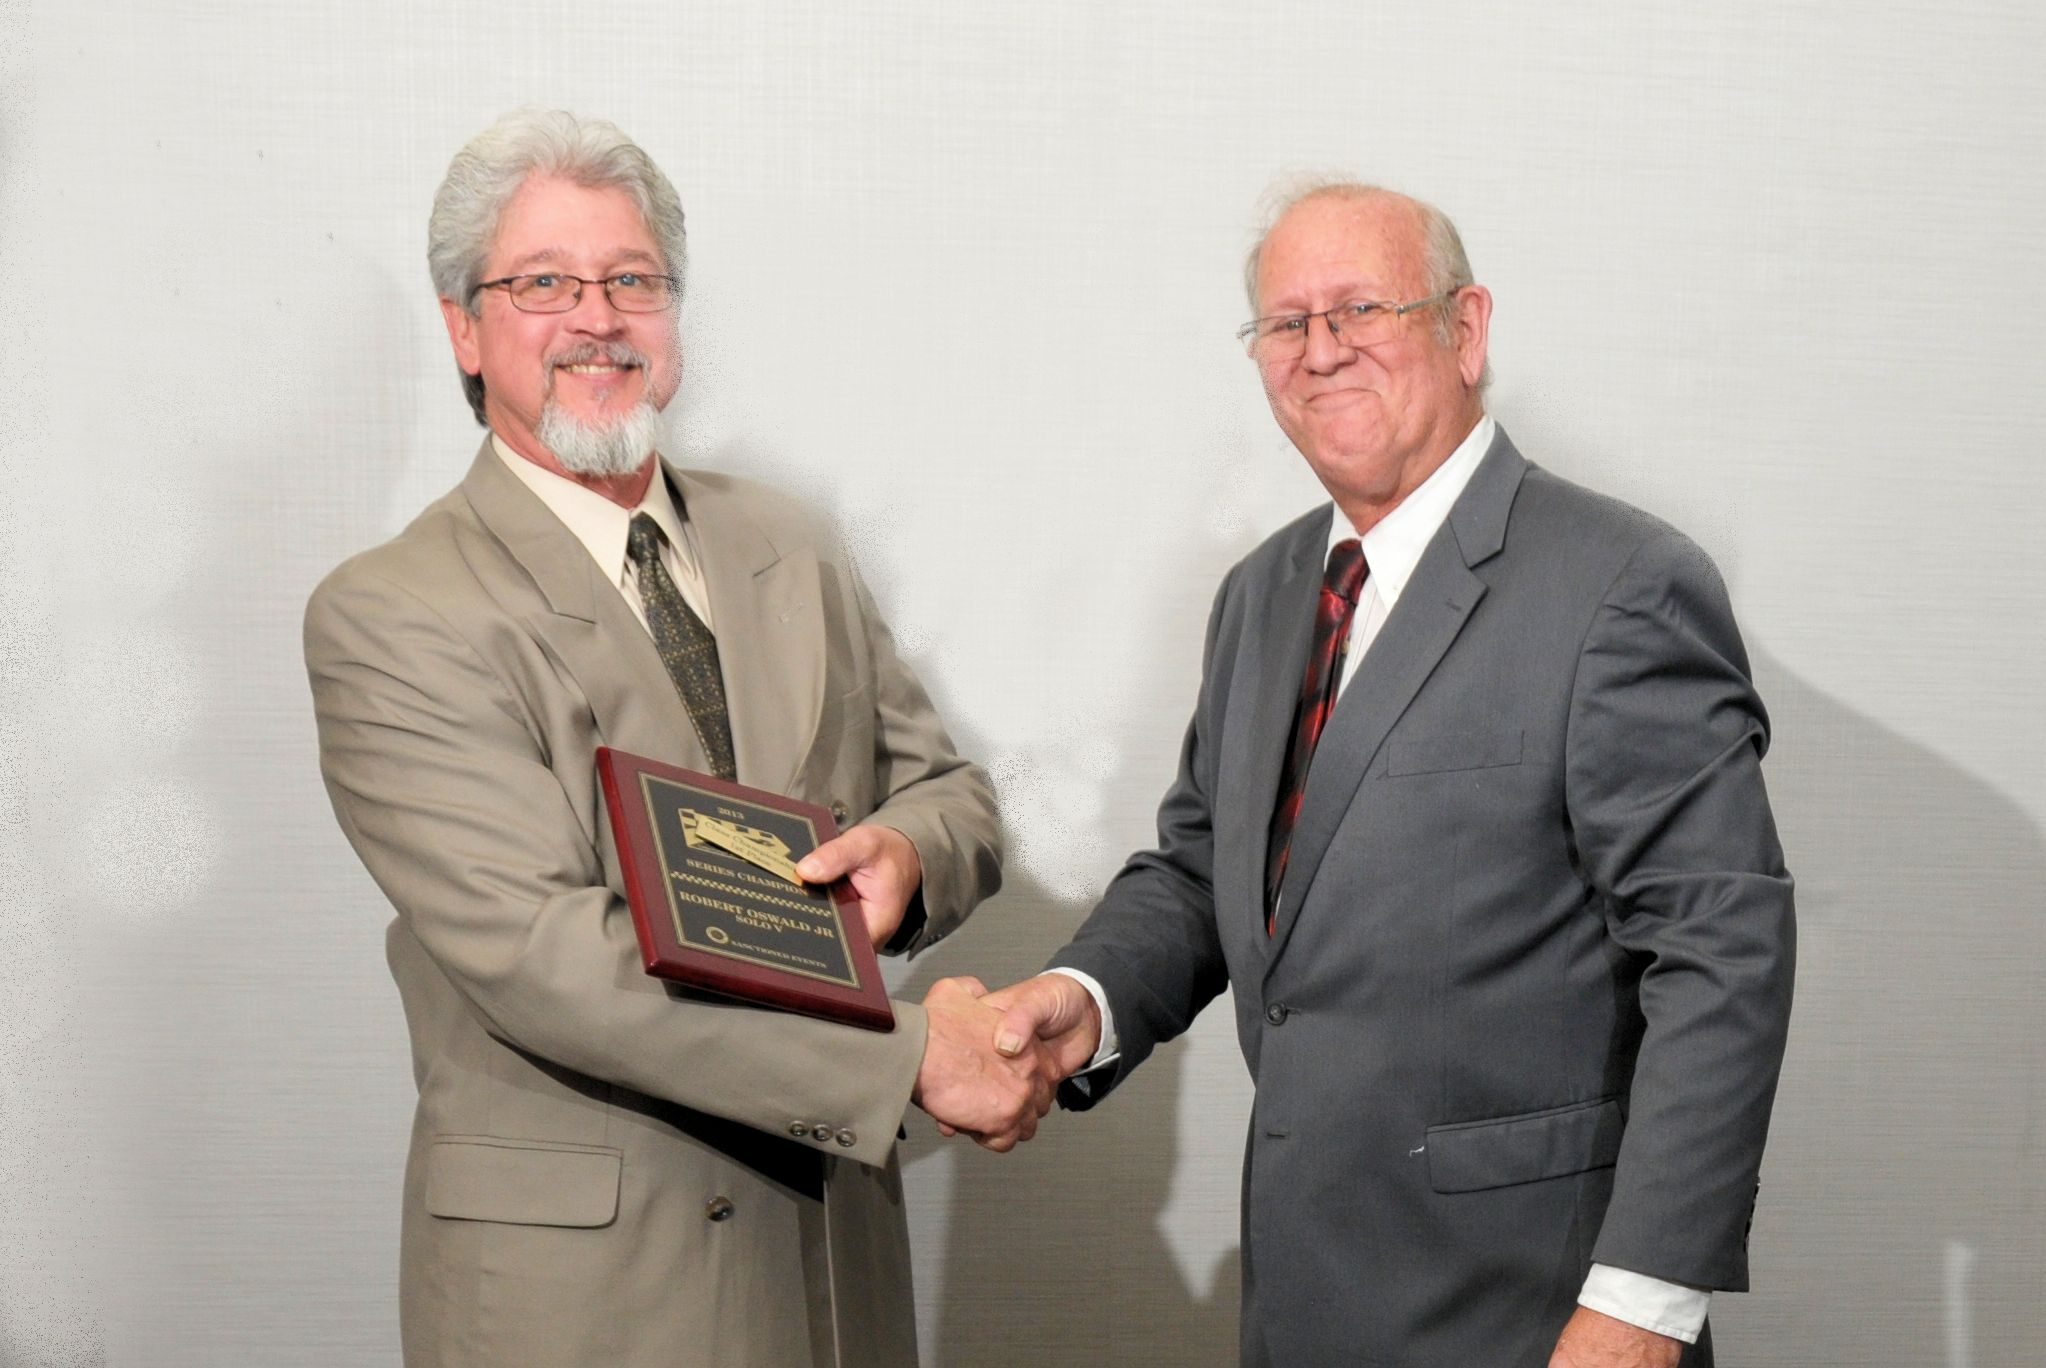 Solo V - Robert Oswald Jr. with PHA President Tom Knorr